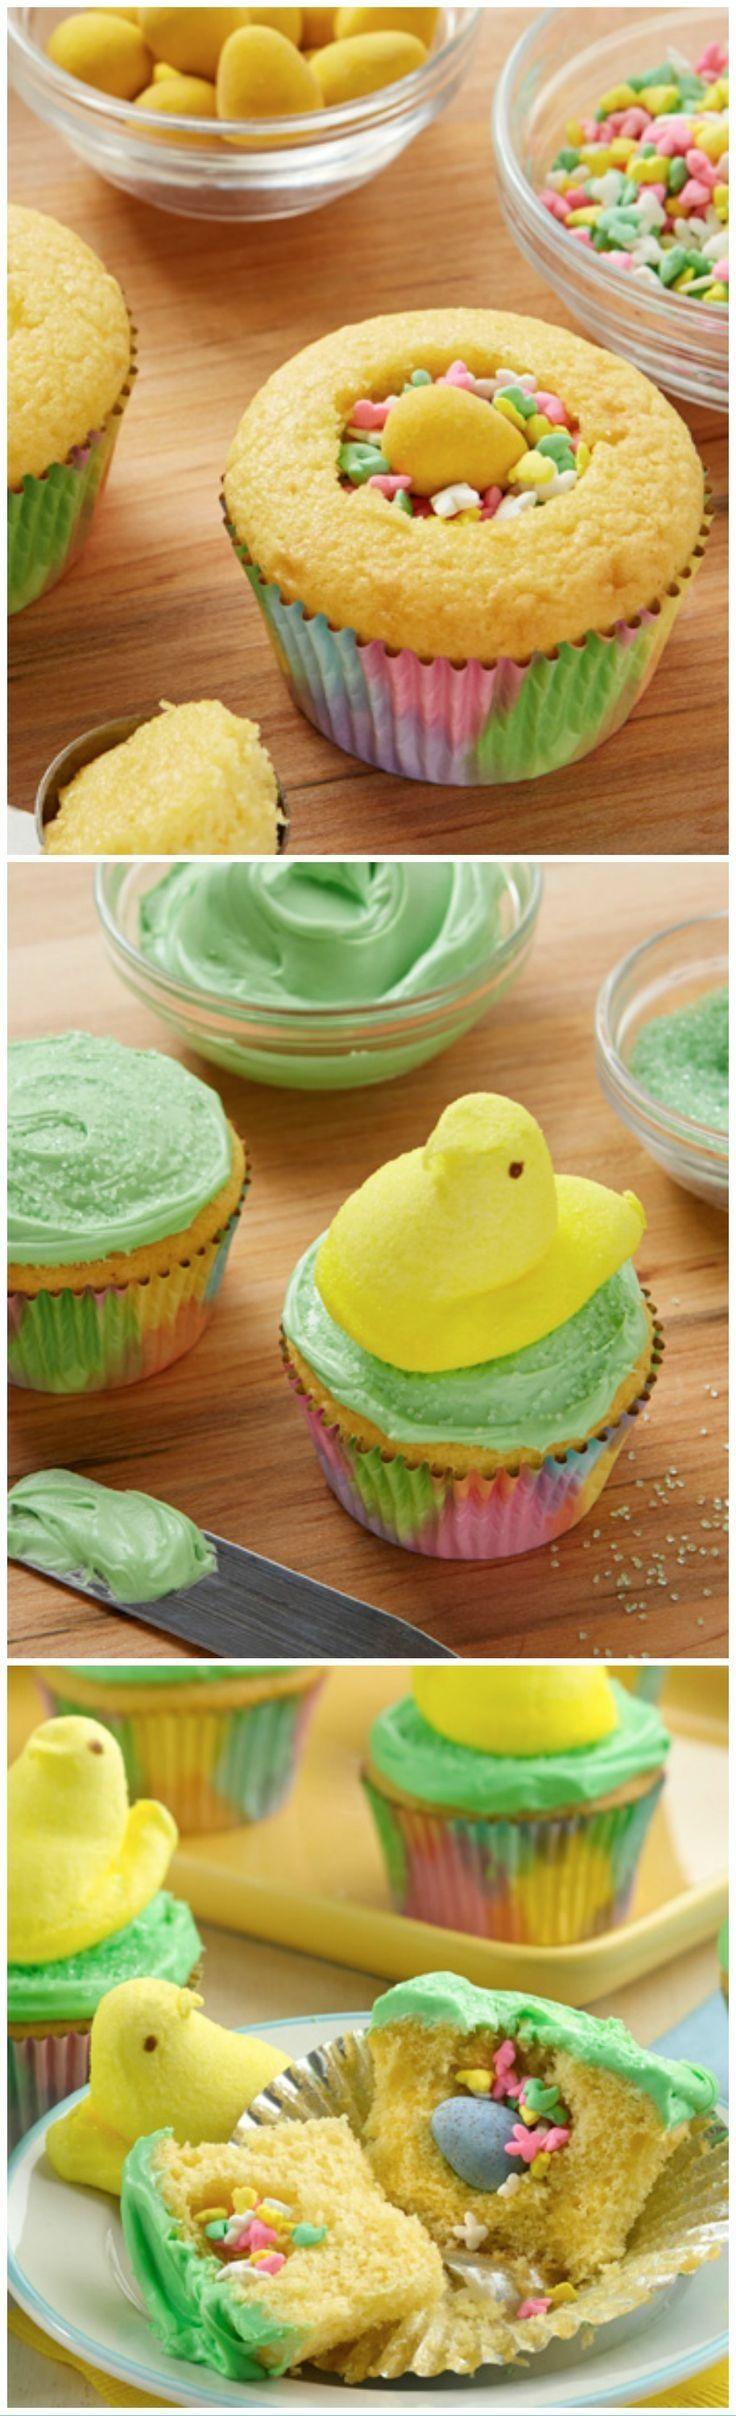 PEEPS® Chick Surprise-Inside Cupcakes | #Chick #Cupcakes #PEEPS® #Surprise-Inside